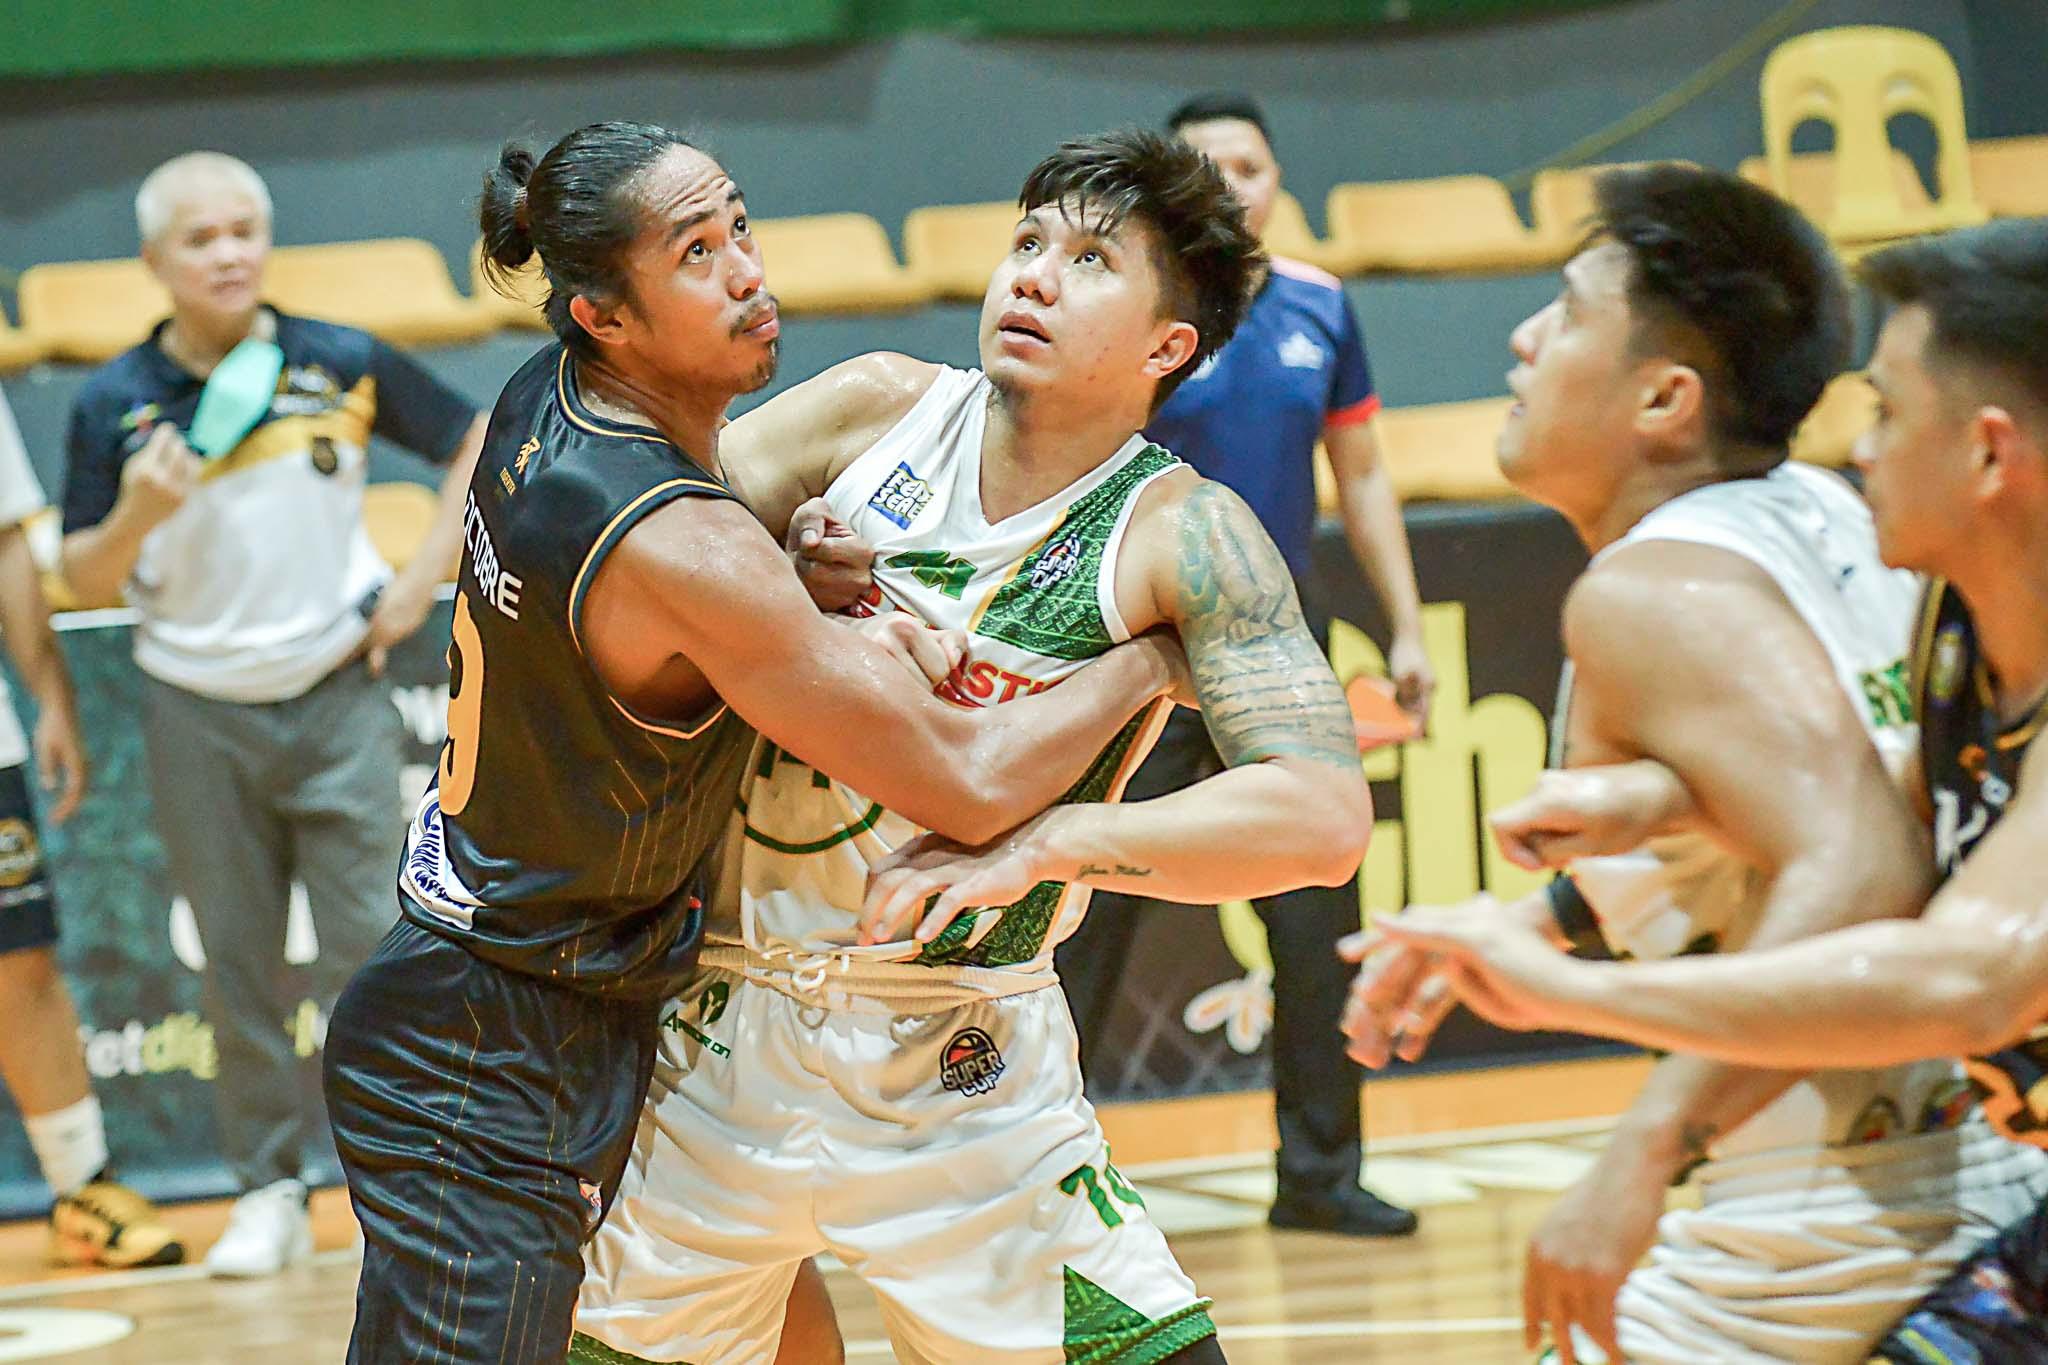 2021-Chooks-VisMin-Southern-Finals-G3-Mandaue-vs-Basilan-Rhaffy-Octobre-vs-Michael-Mabulac Mabulac fulfills promise to wife after copping VisMin Finals MVP plum Basketball News VisMin Super Cup  - philippine sports news